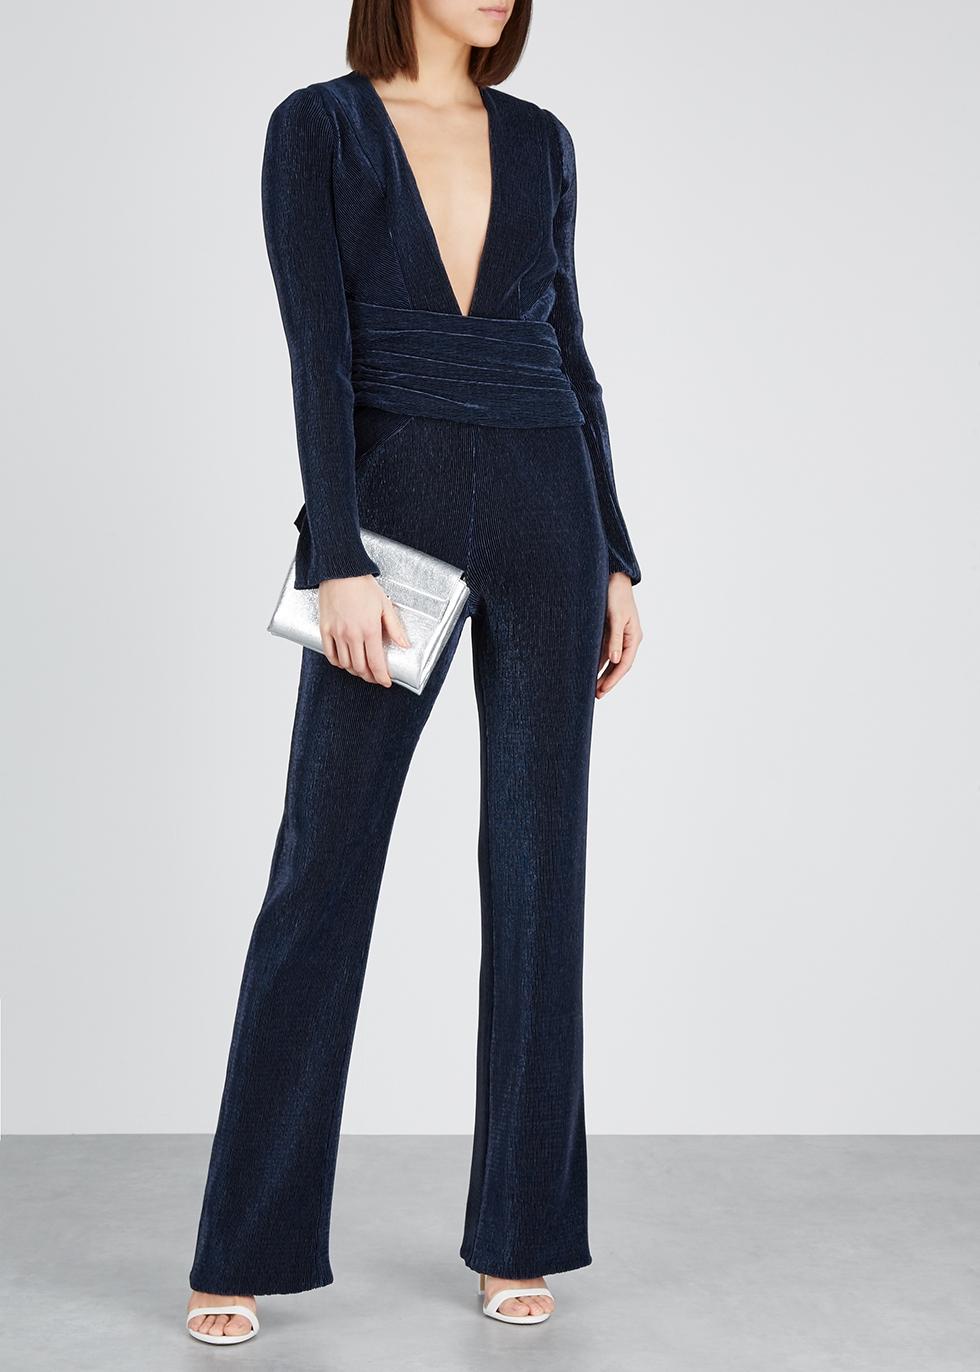 Designer Jumpsuits And Luxury Playsuits Harvey Nichols